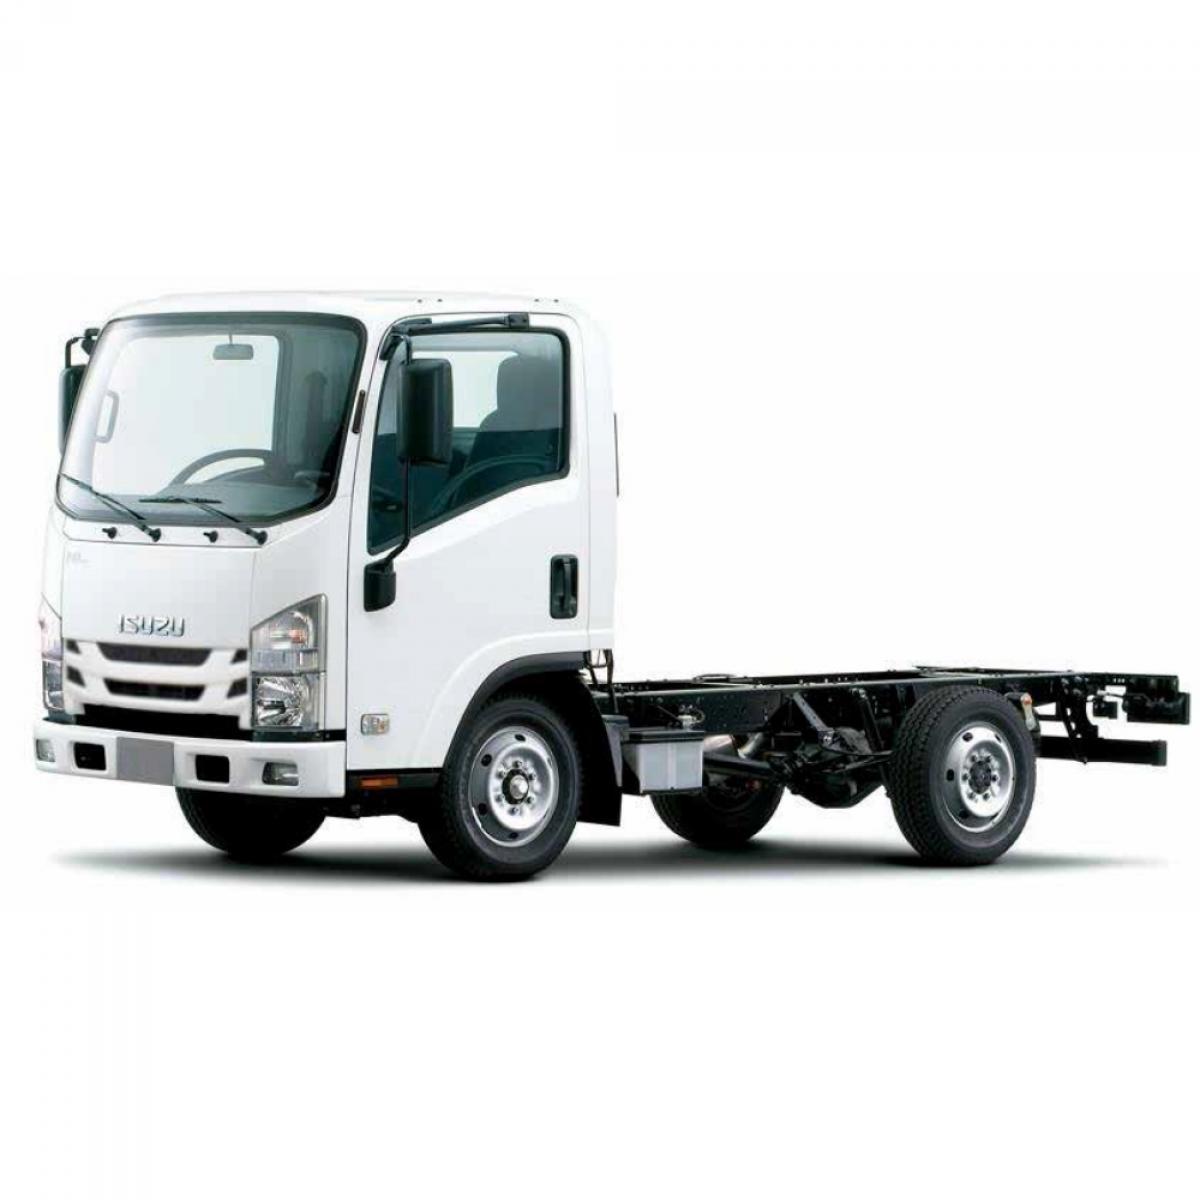 Isuzu M21 Single Tire Design